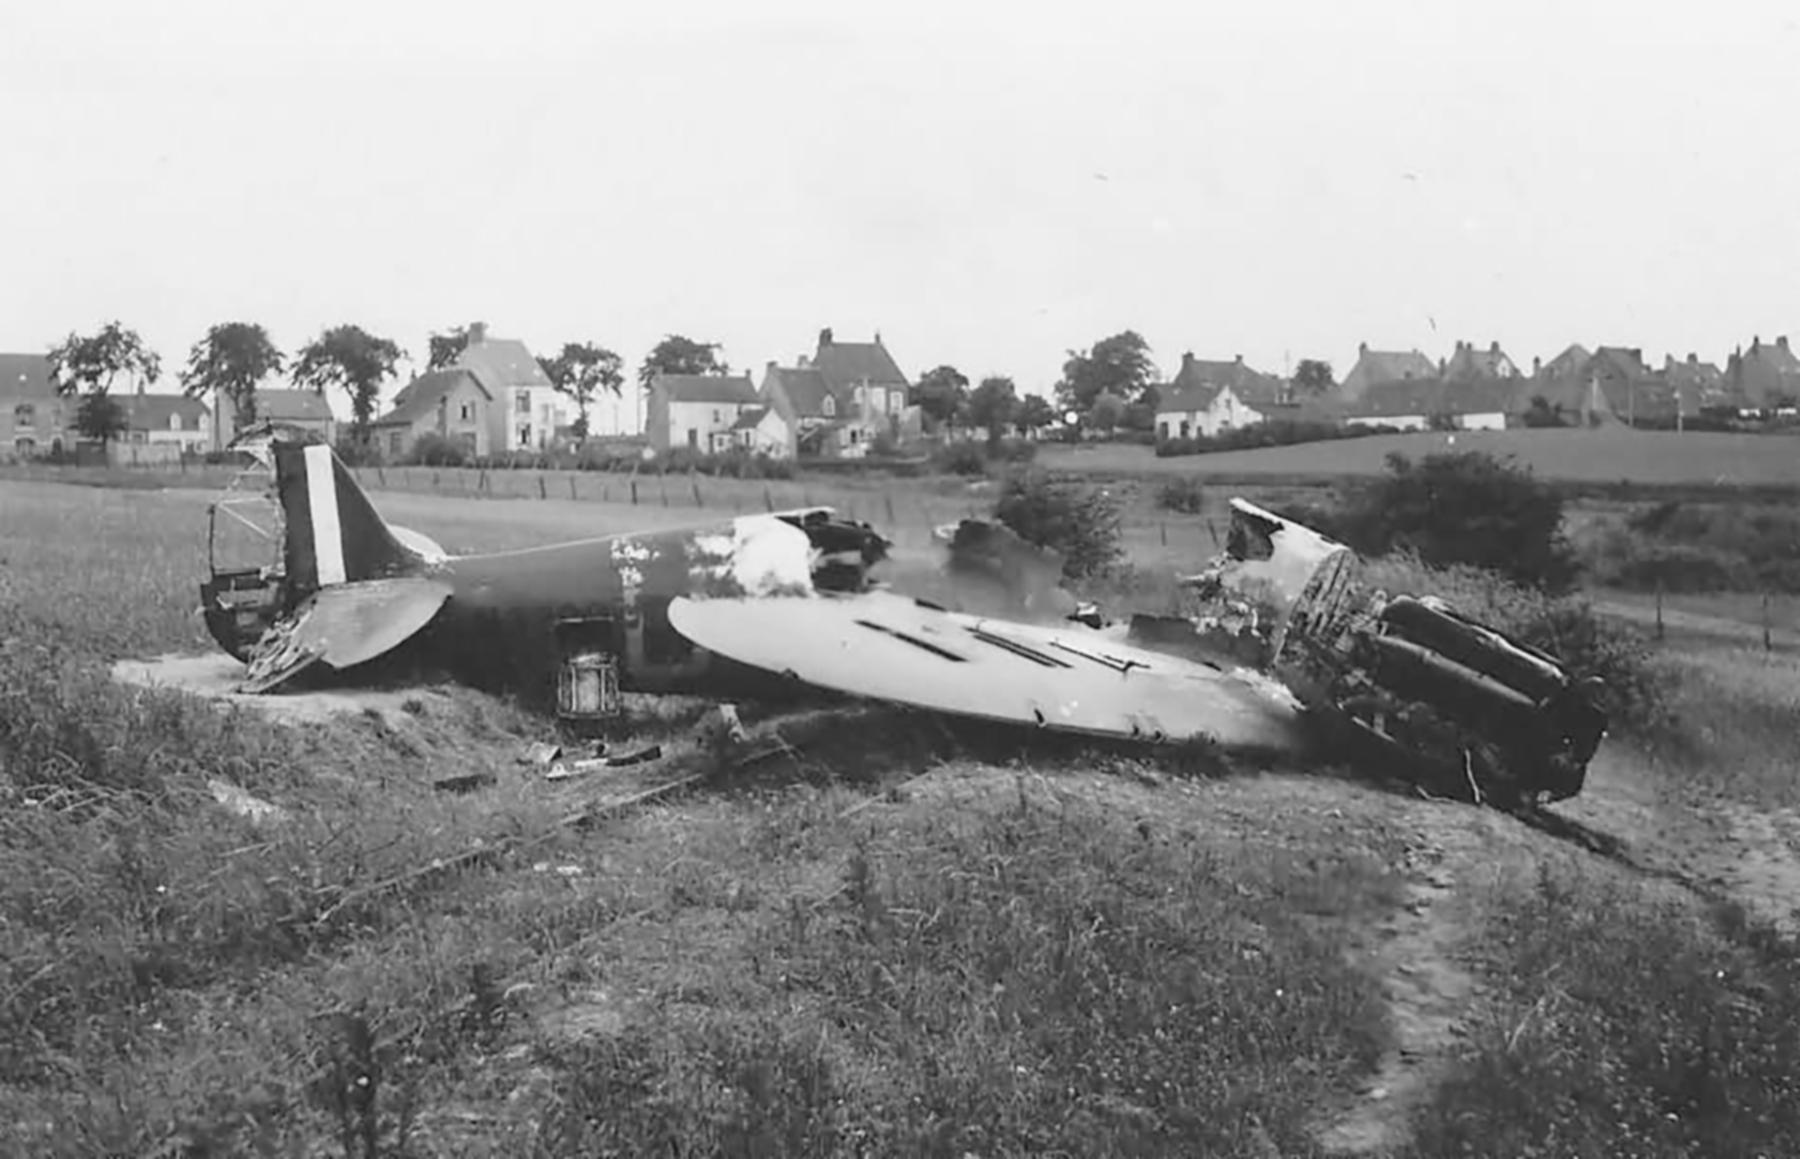 Spitfire MkI destroyed over France during the Battle of France May 1940 web 01